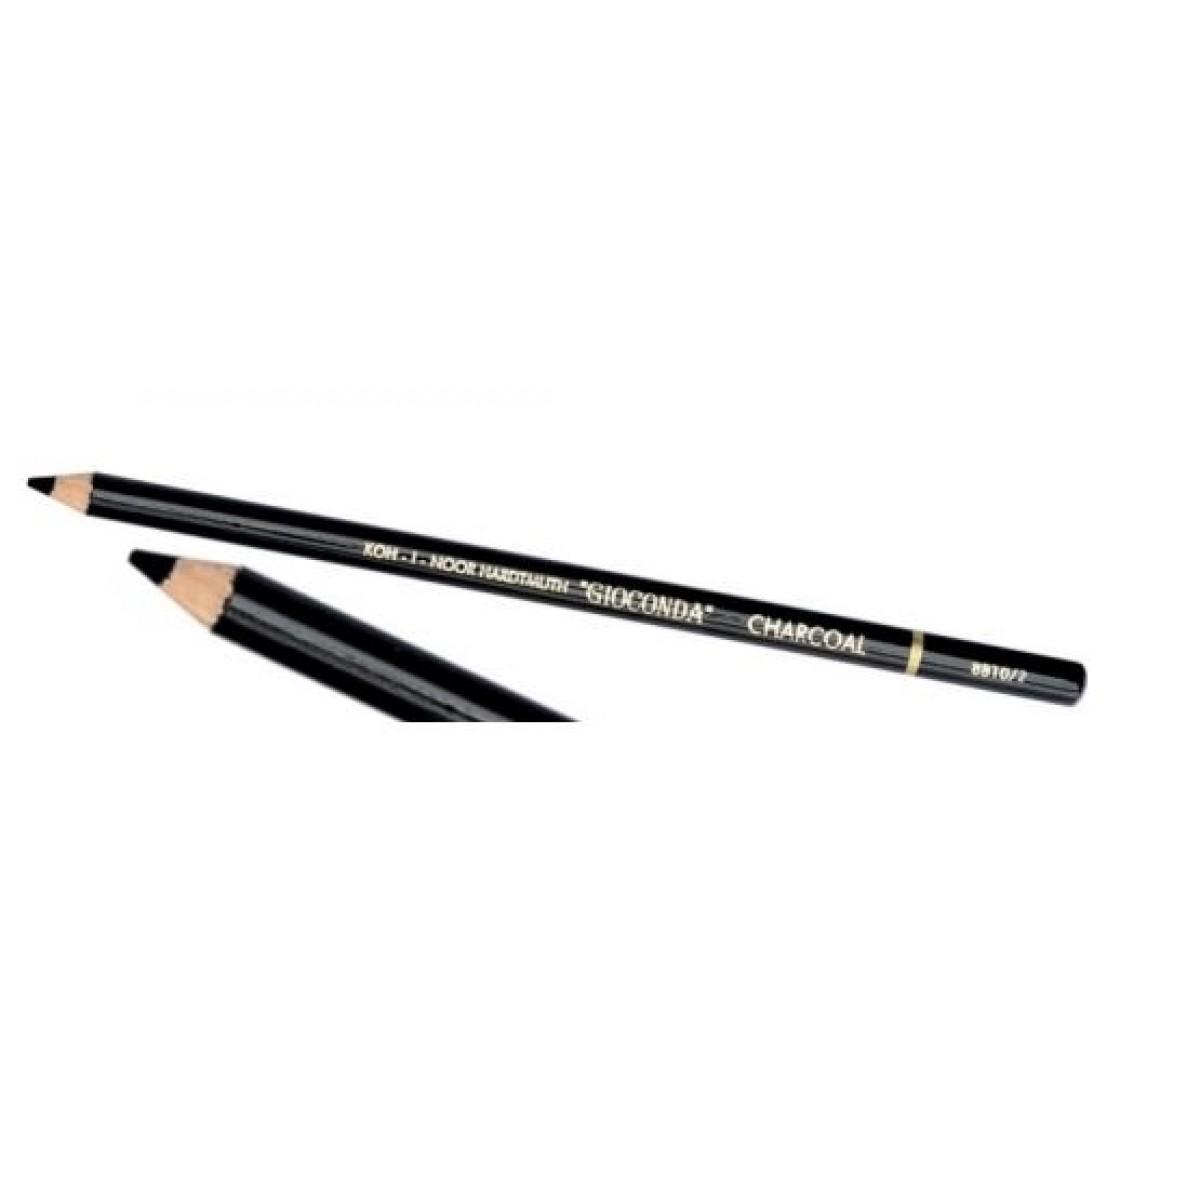 Sort kul blyant fra Koh-I-Noor